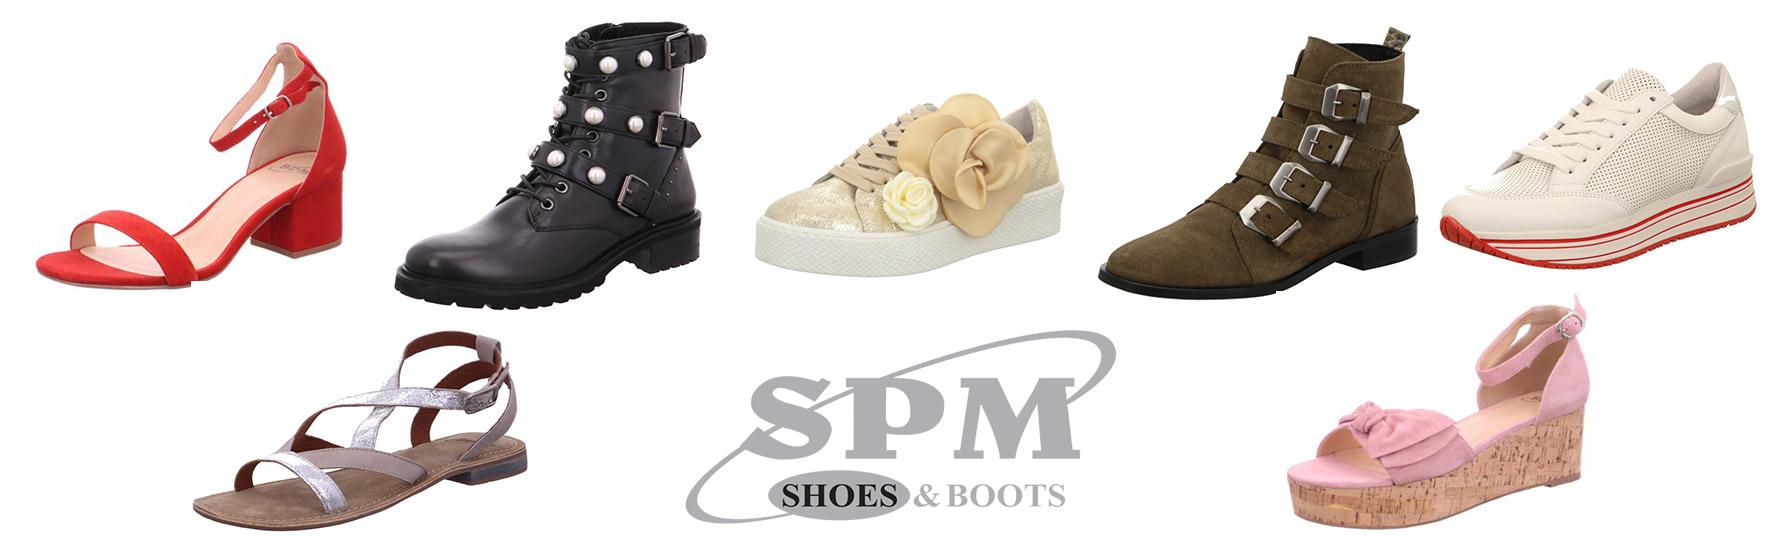 543d0d886f SPM Schuhe großer Auswahl günstig online kaufen | Schuhe24